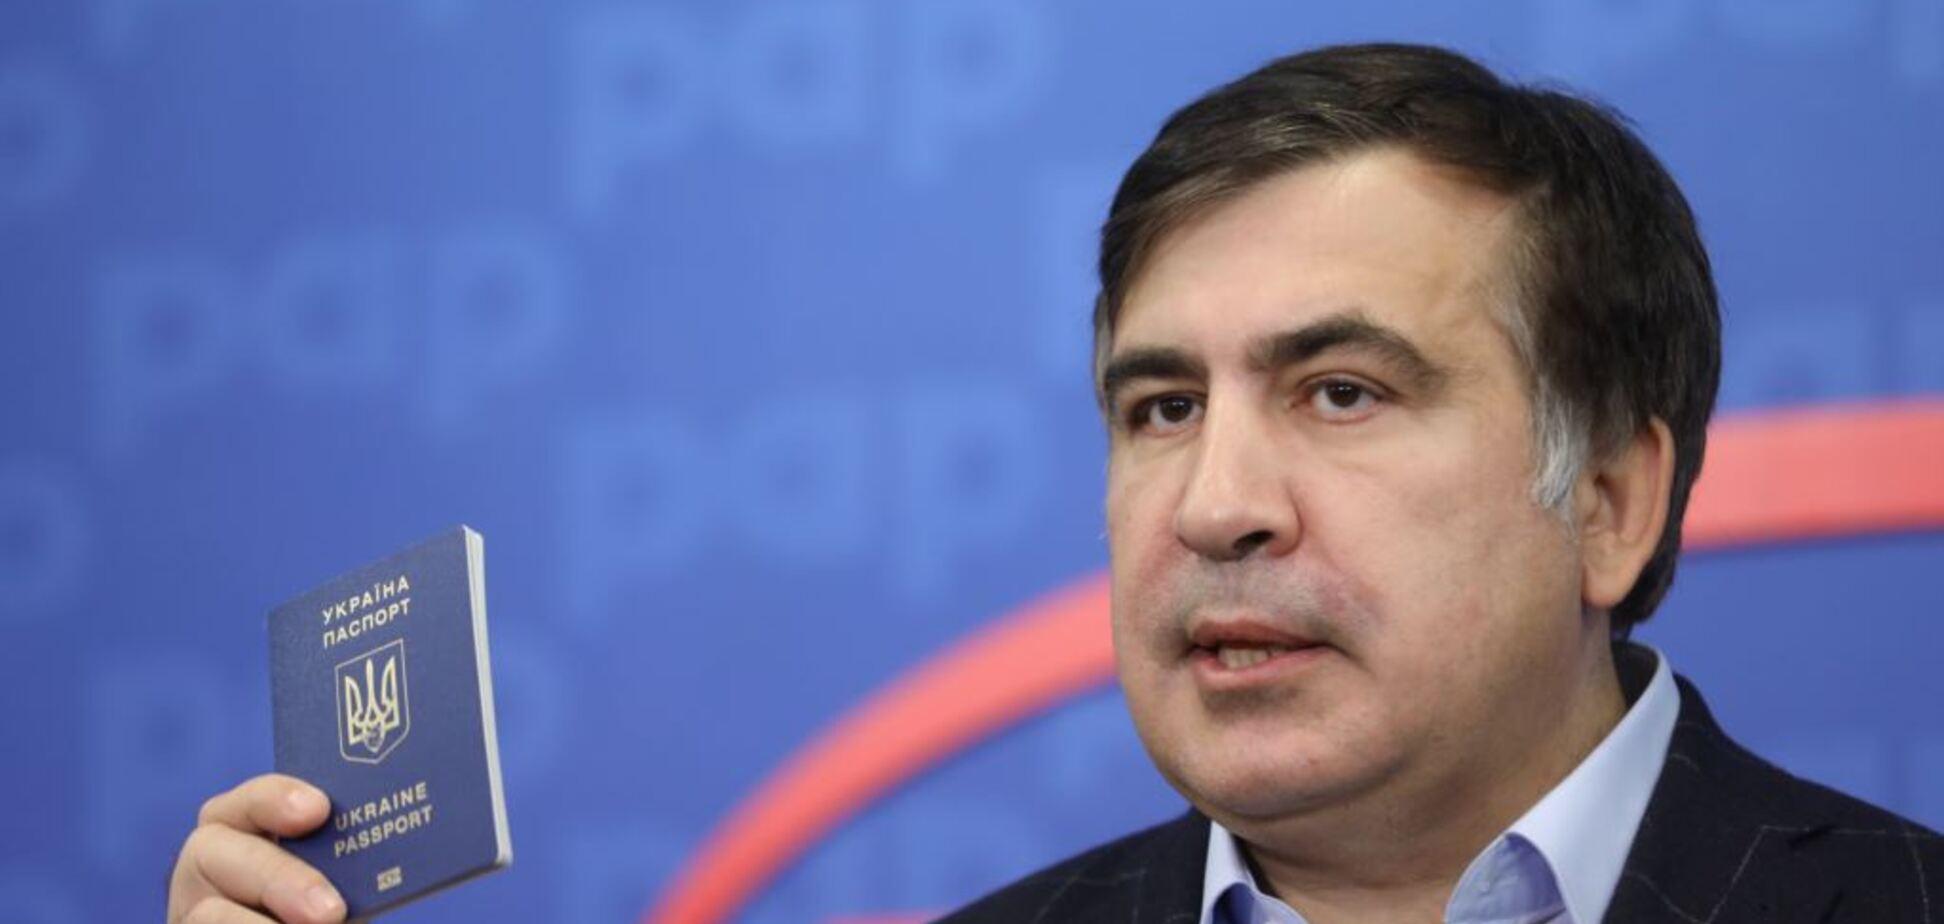 Саакашвили паспорт